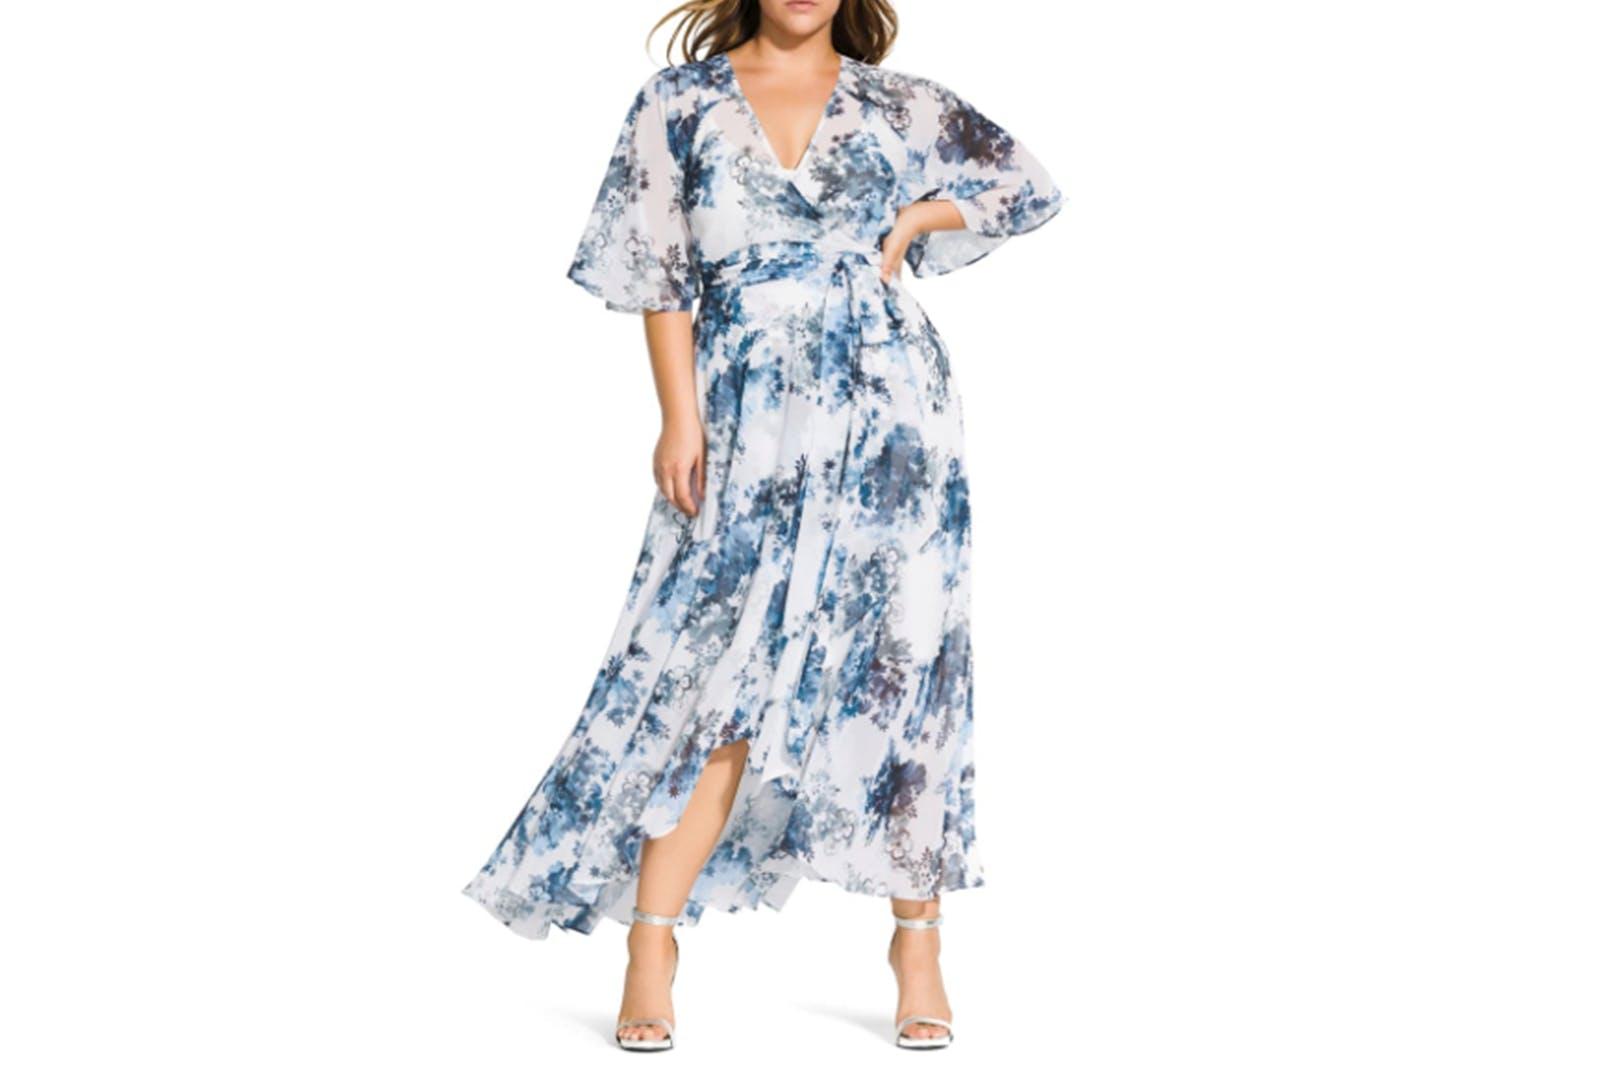 dresses for big boobs floral wrap dress